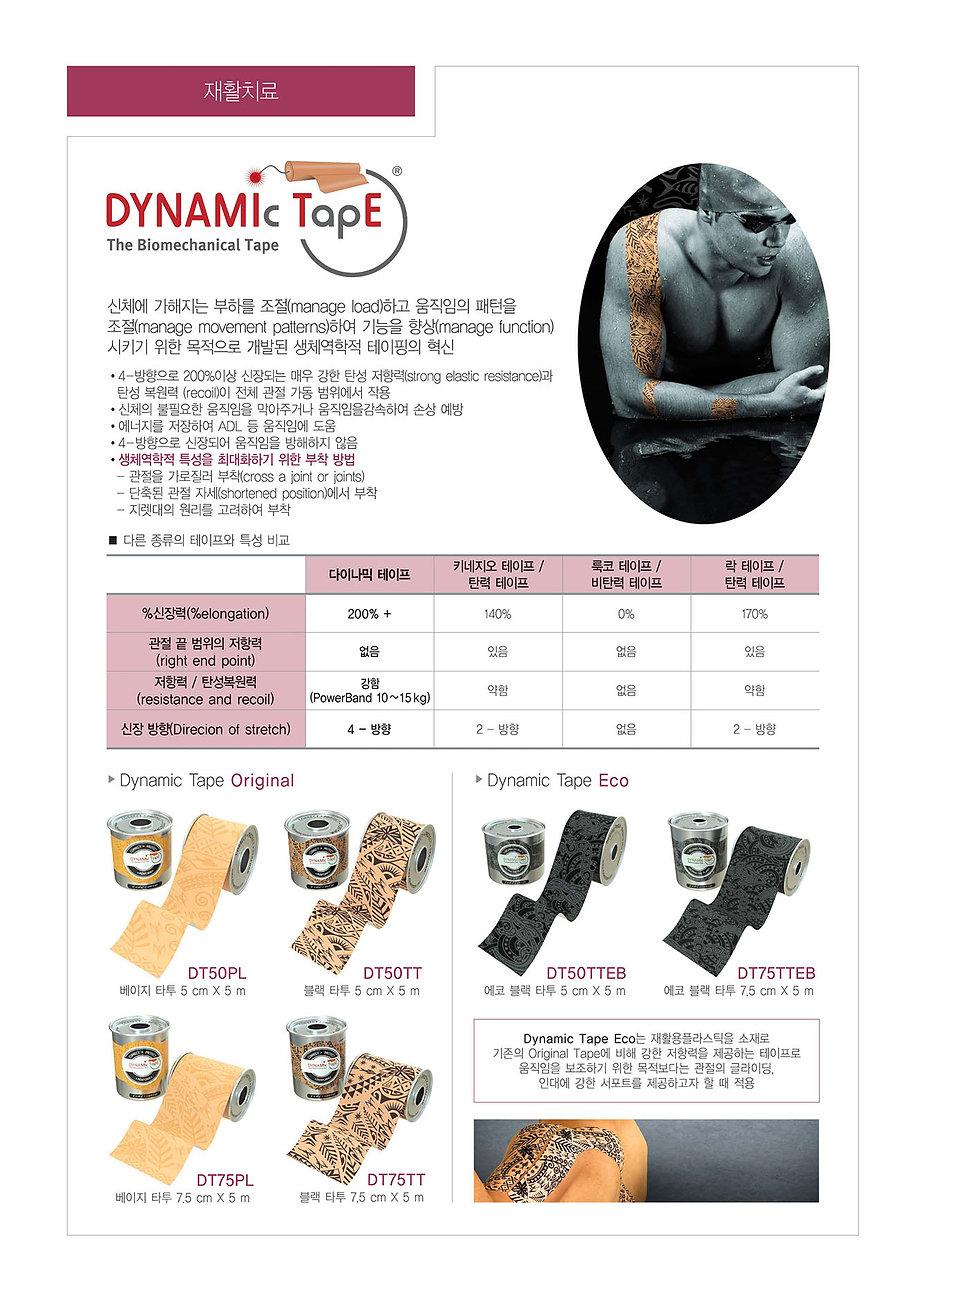 dynamictape.jpg